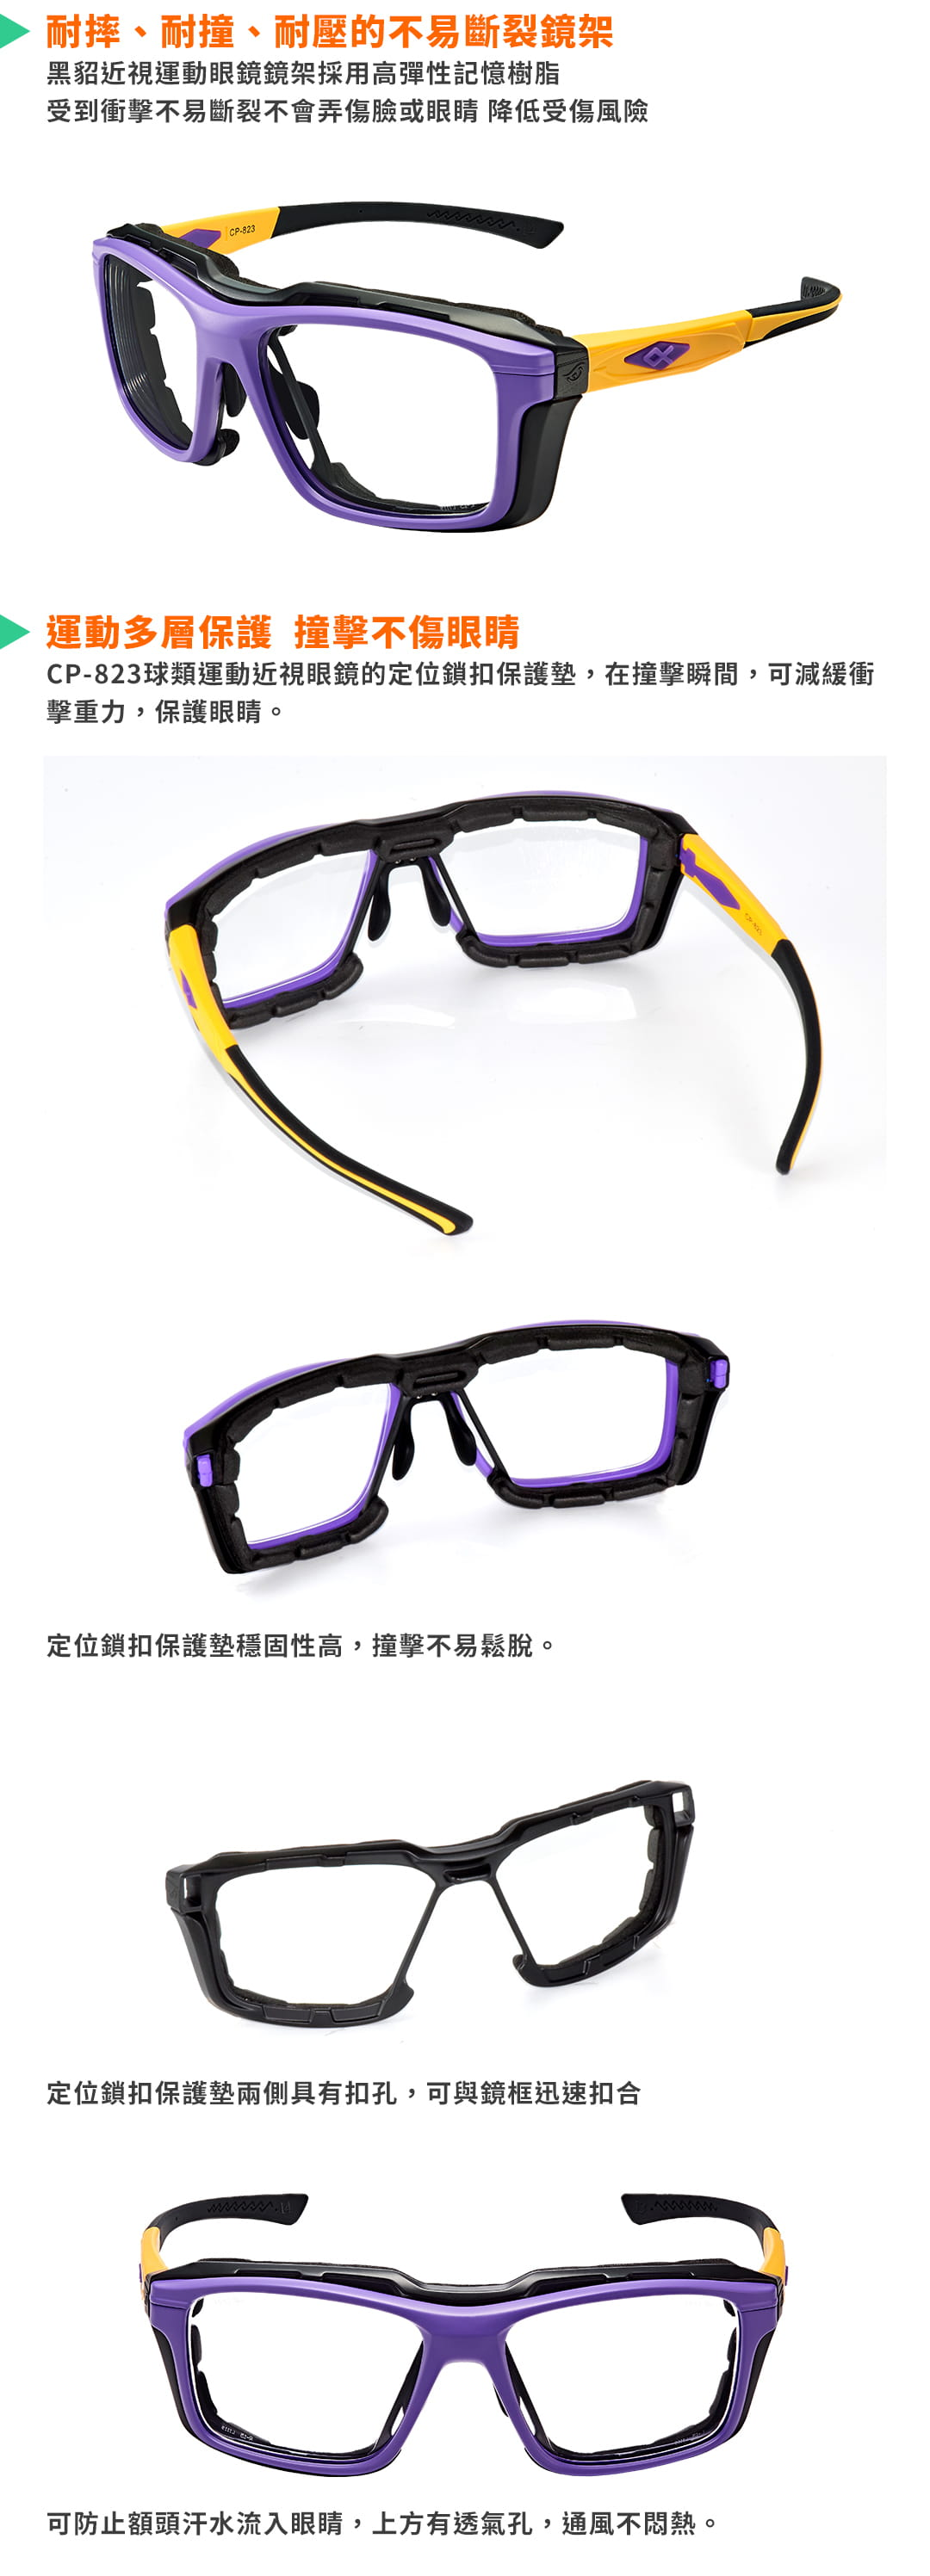 SABLE黑貂光學-專屬球類運動眼鏡CP-823(標準款-無保護墊)+SP-03(平光精緻鍍膜鏡片) 10